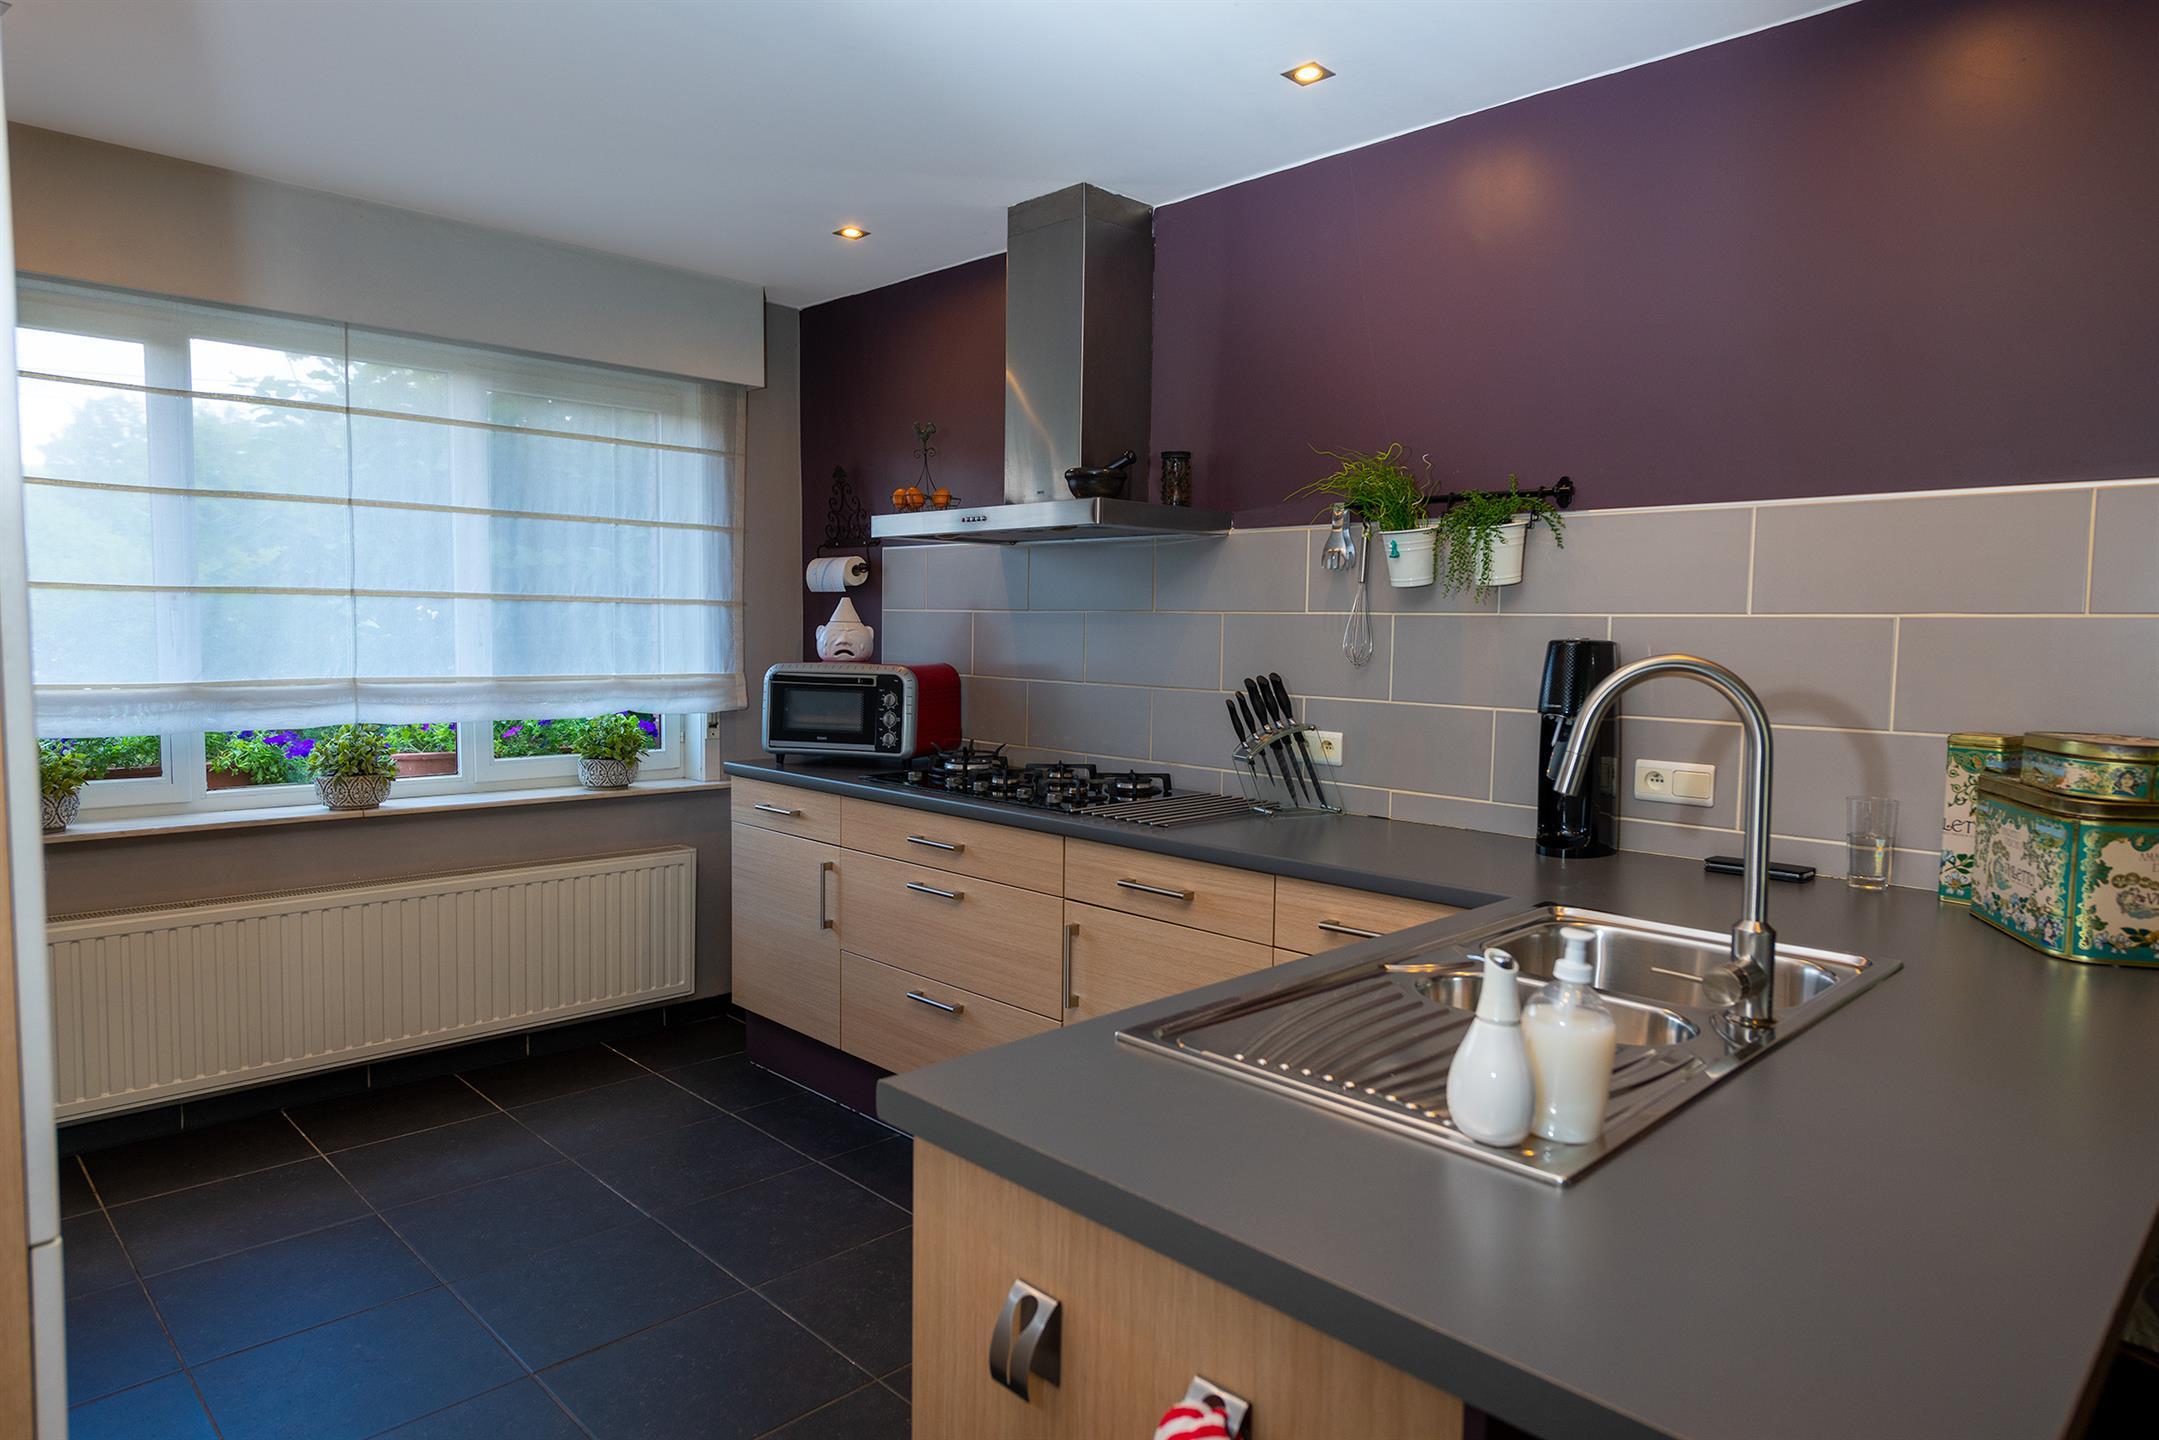 Charmant huis - Sint-Katelijne-Waver - #4492892-6